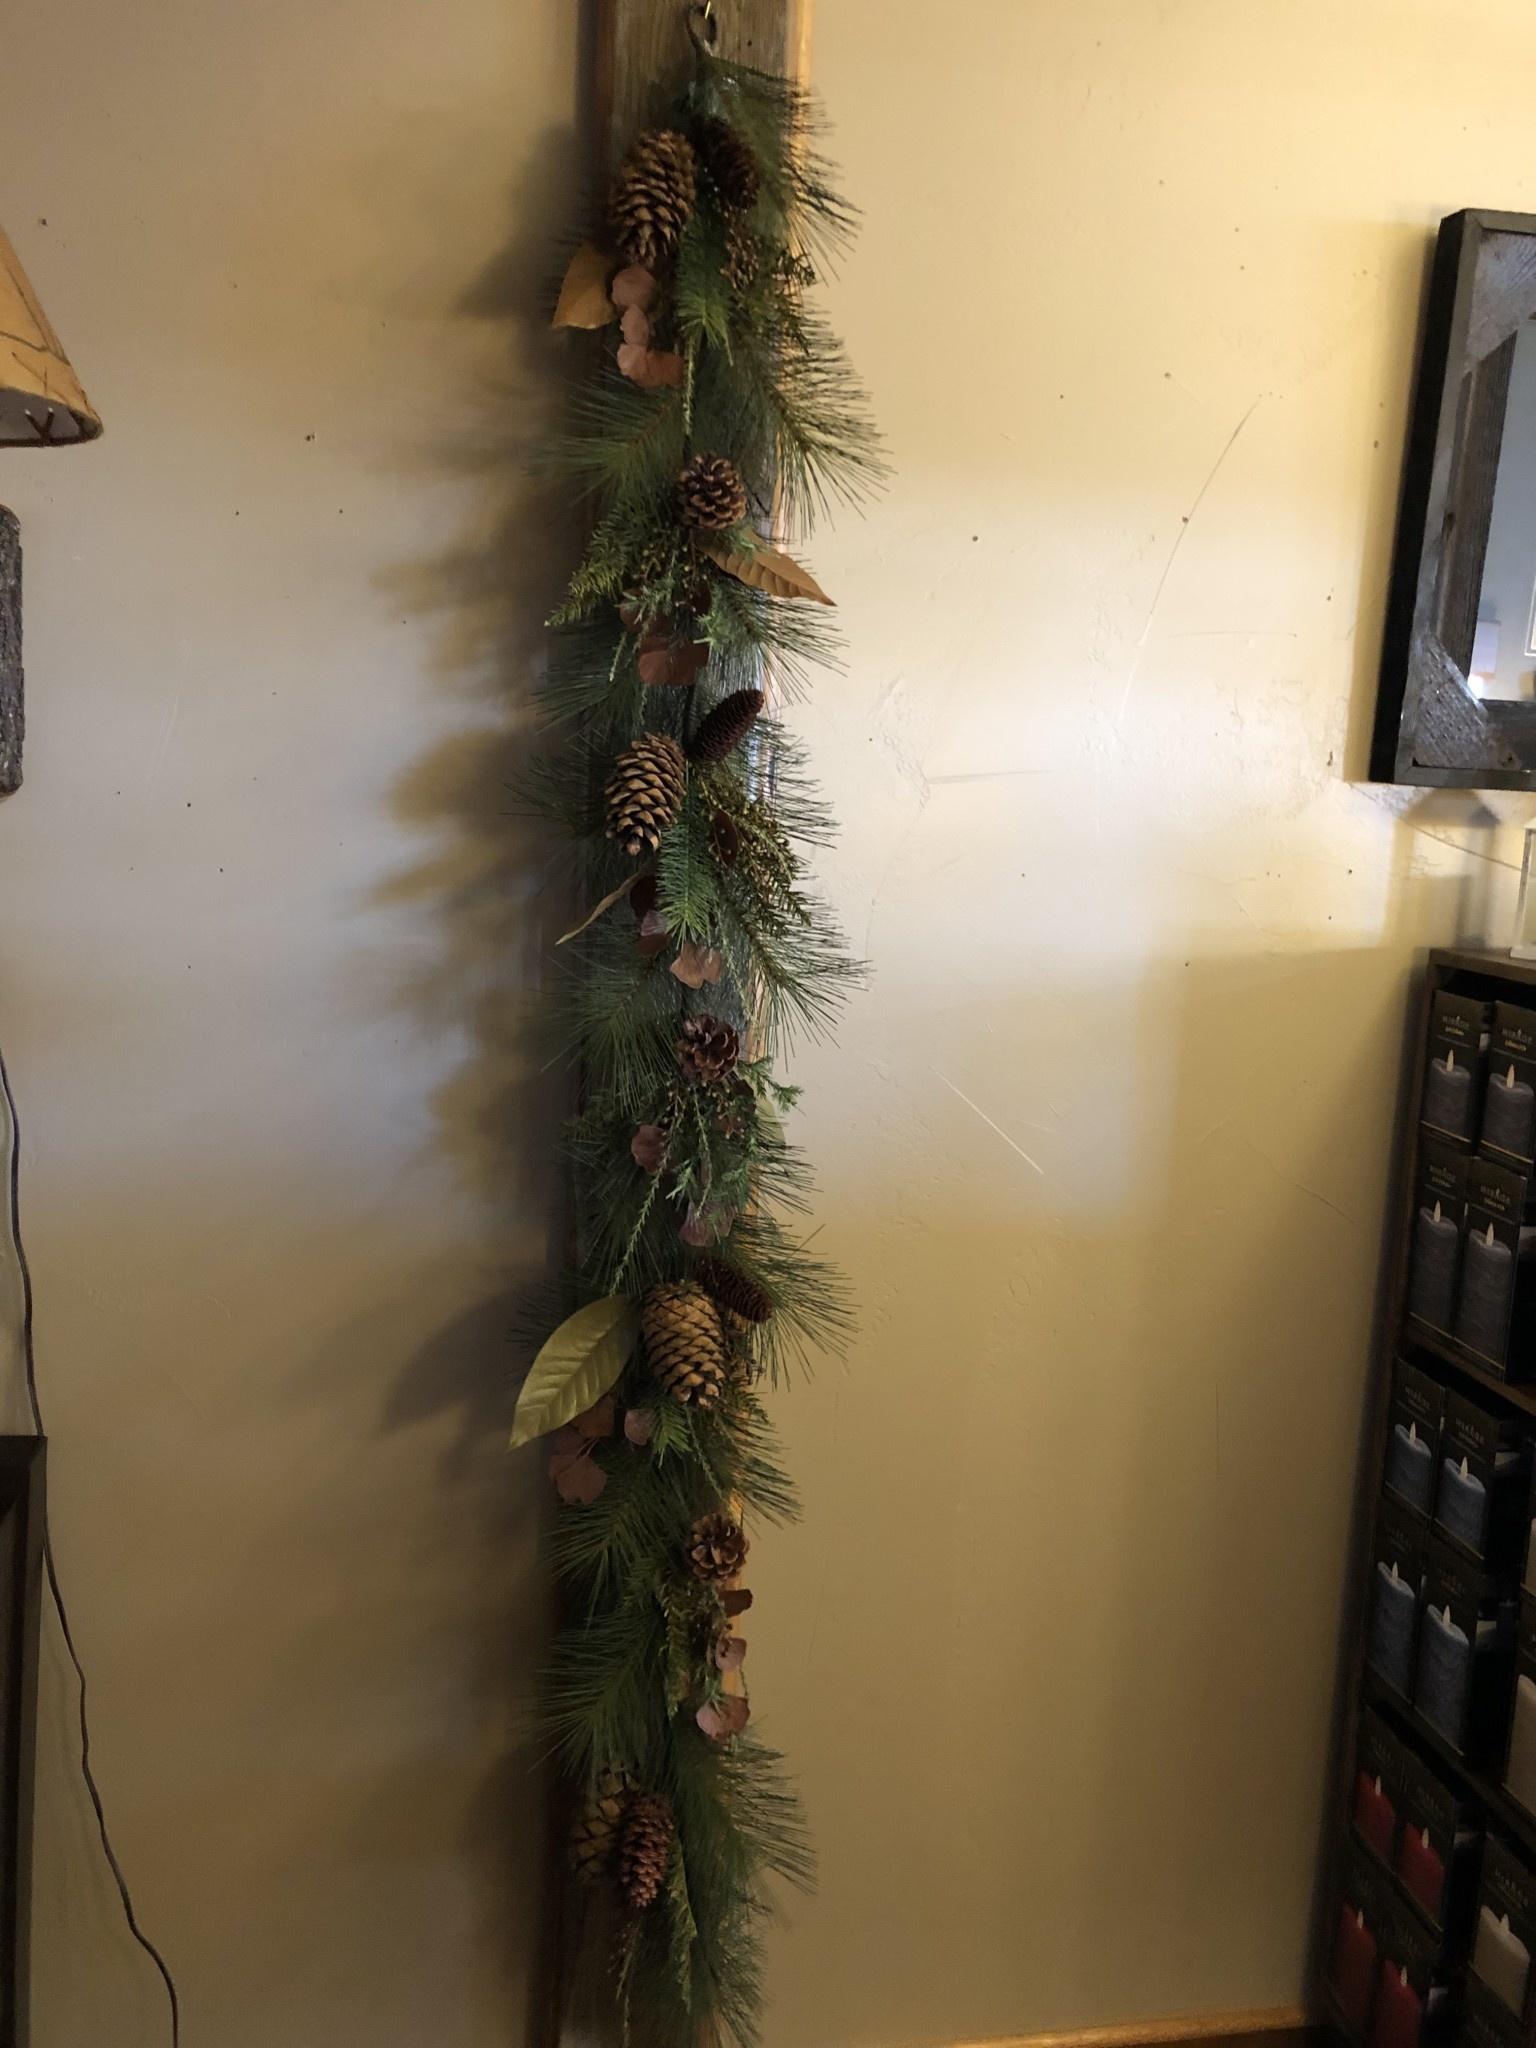 Sullivans Earthy Delight Pine Garland 6' GD1340